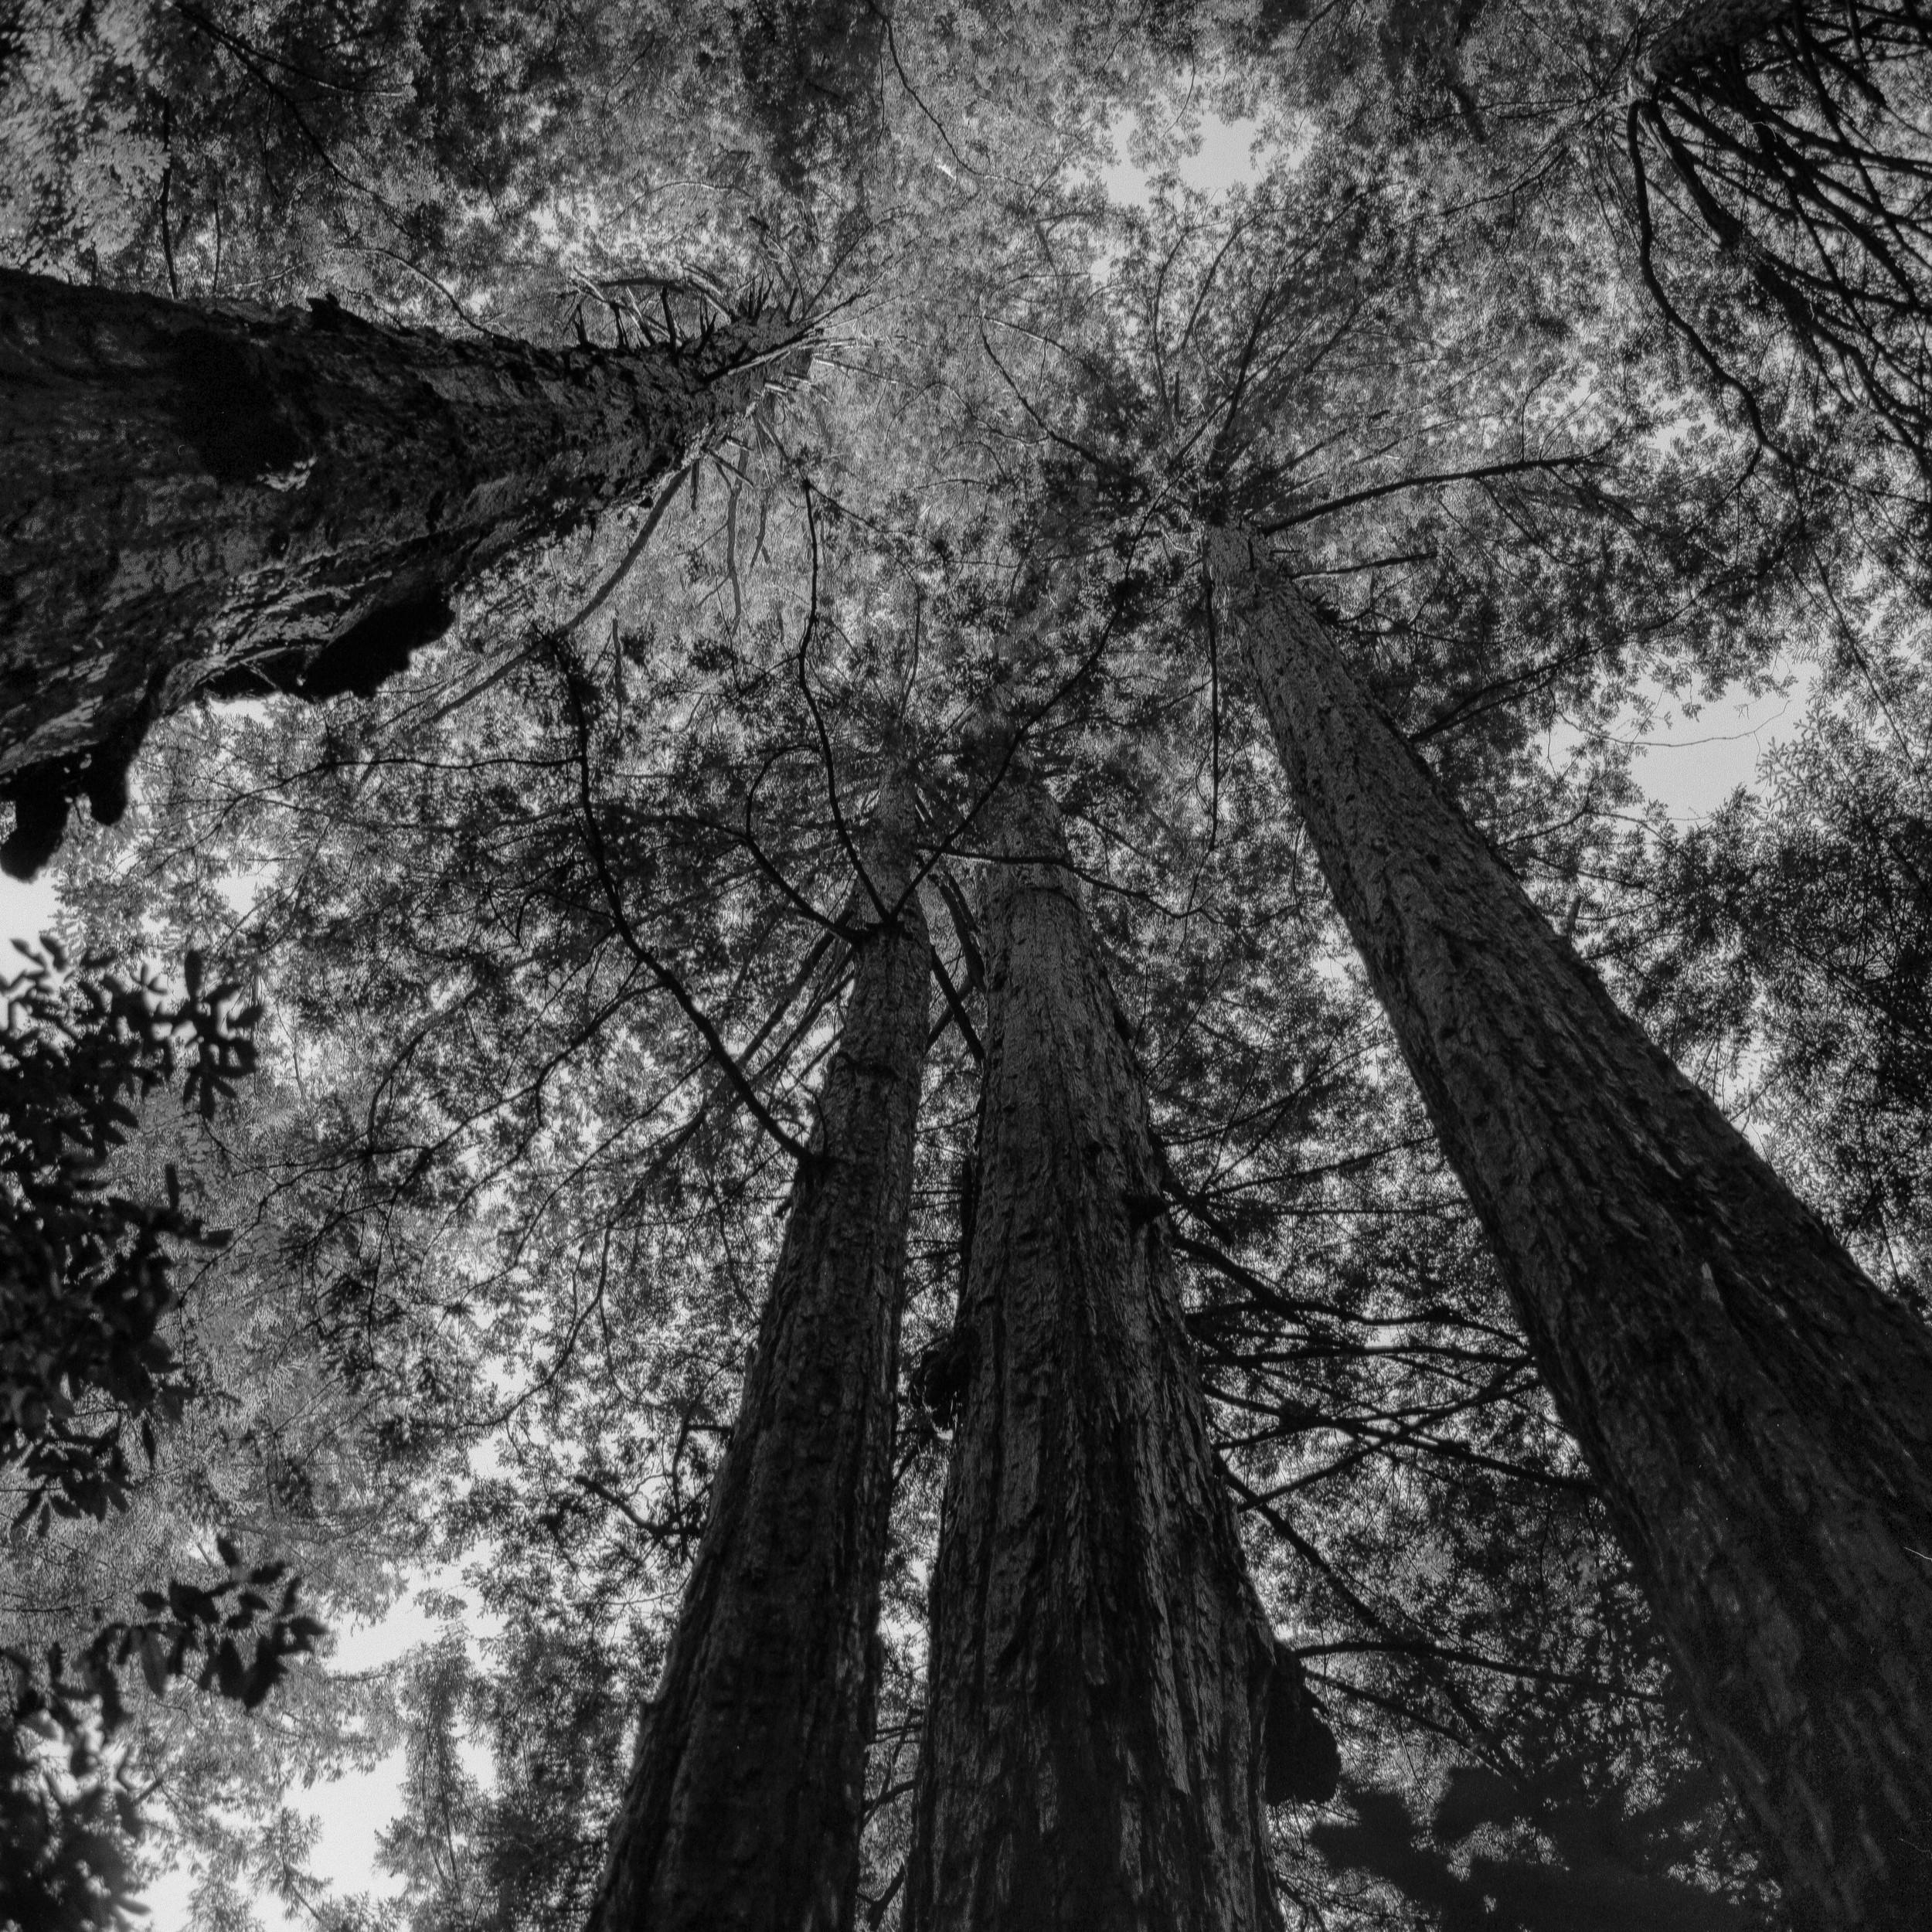 Redwood Canopy, California - 2016